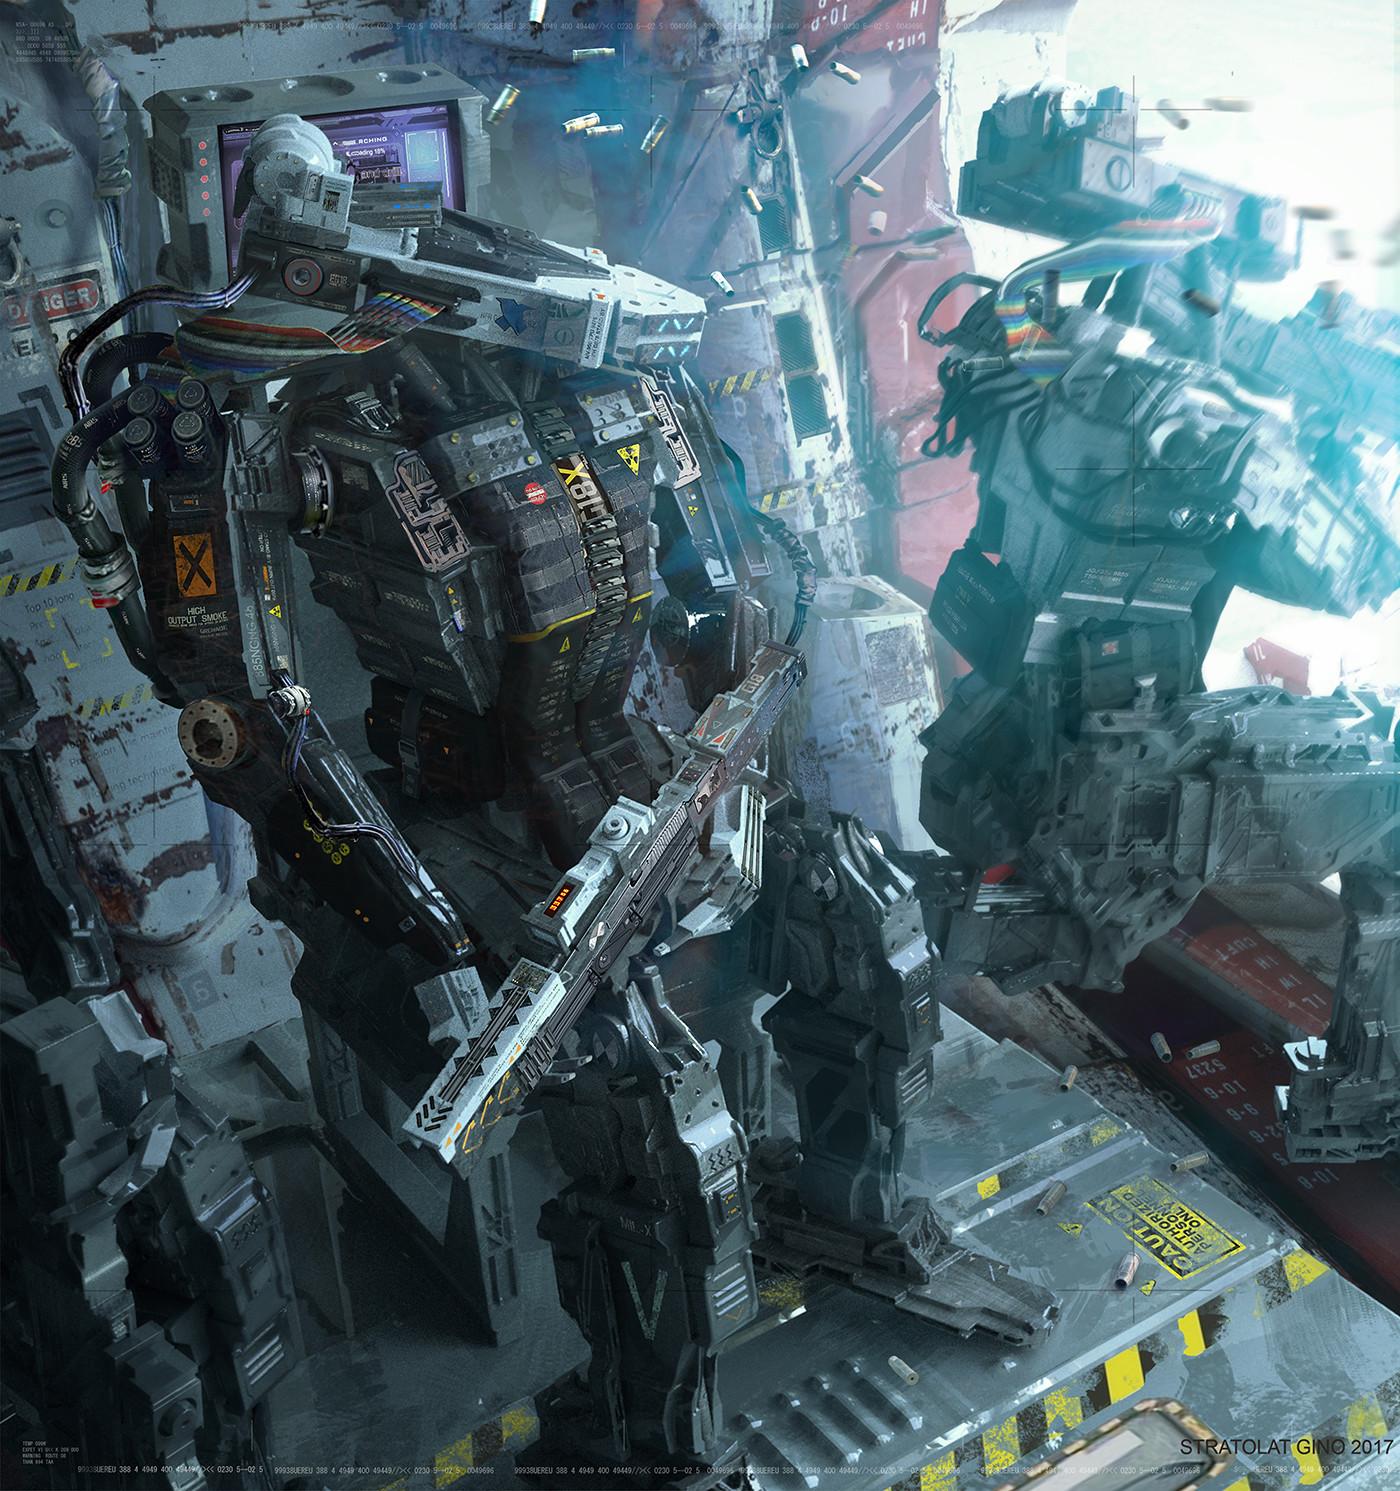 The Futuristic Sci-Fi Art of Gino Stratolat